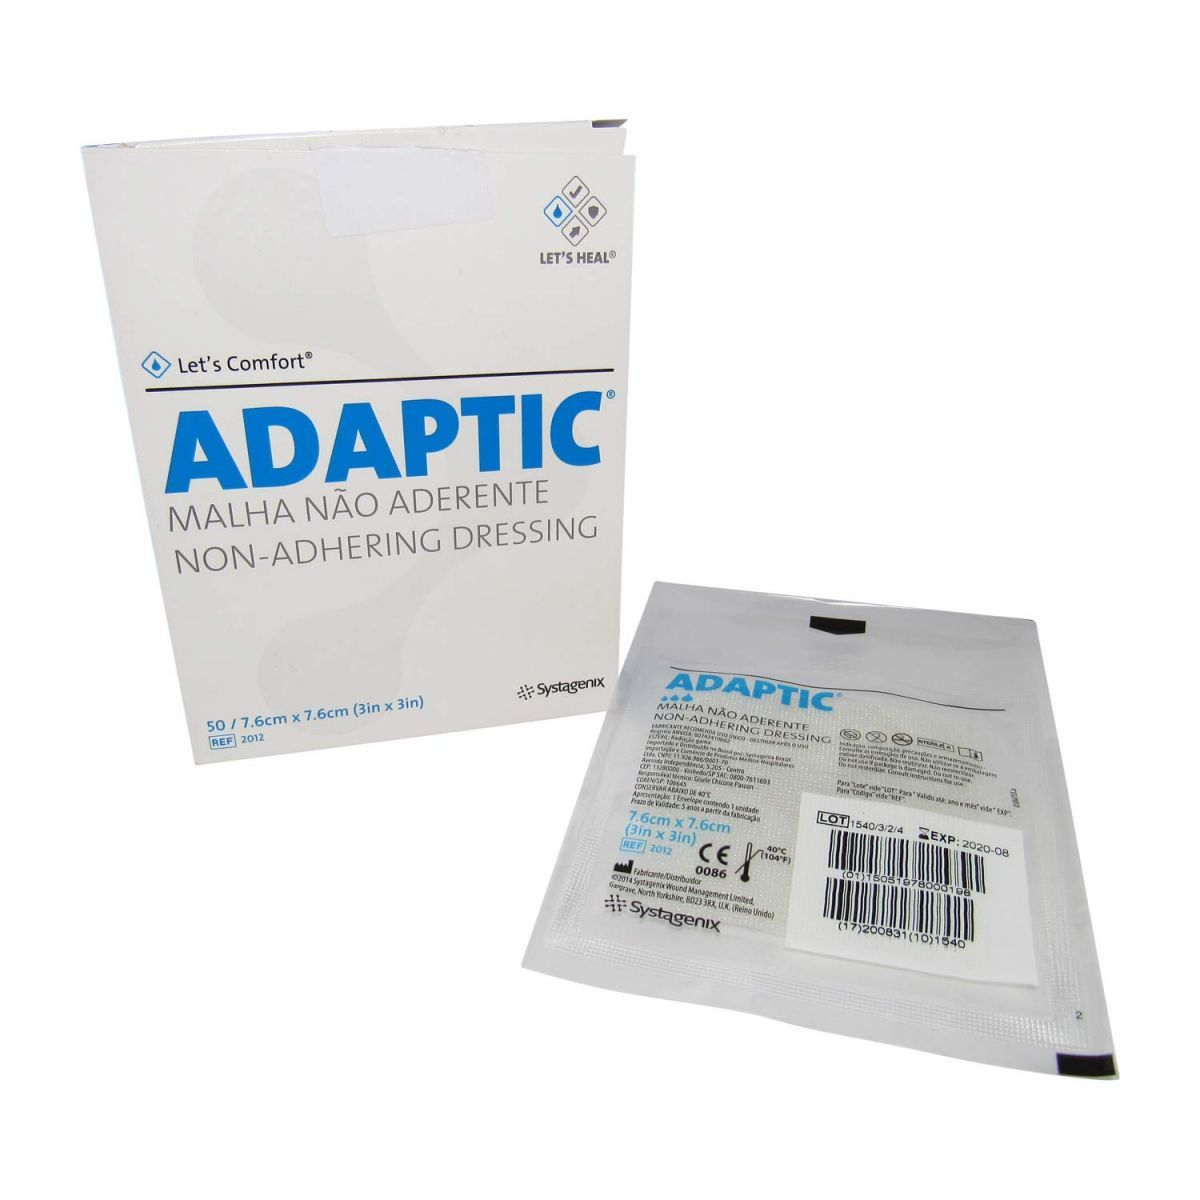 Adaptic 7,6 x 7,6cm Curativo cx com 20 Unidades